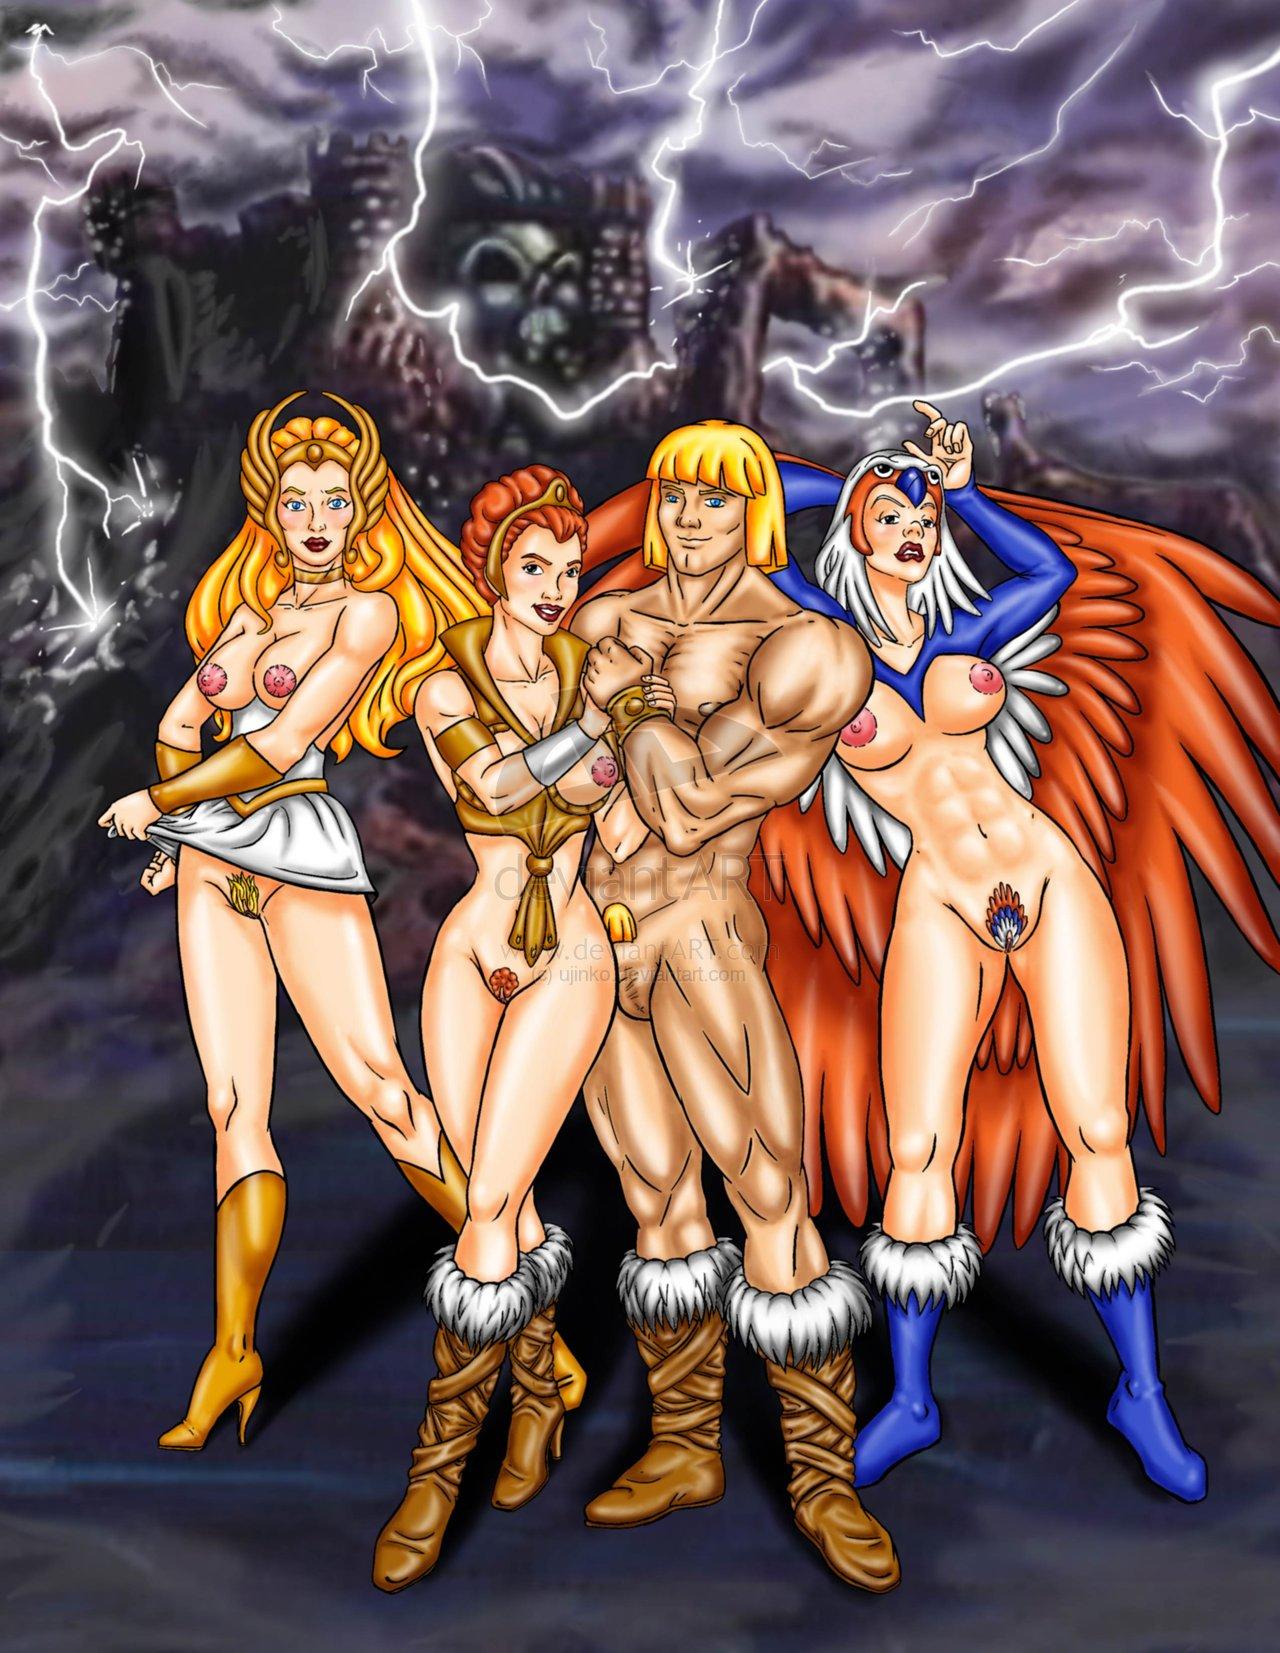 world of gem amethyst princess - Legend of zelda wall master